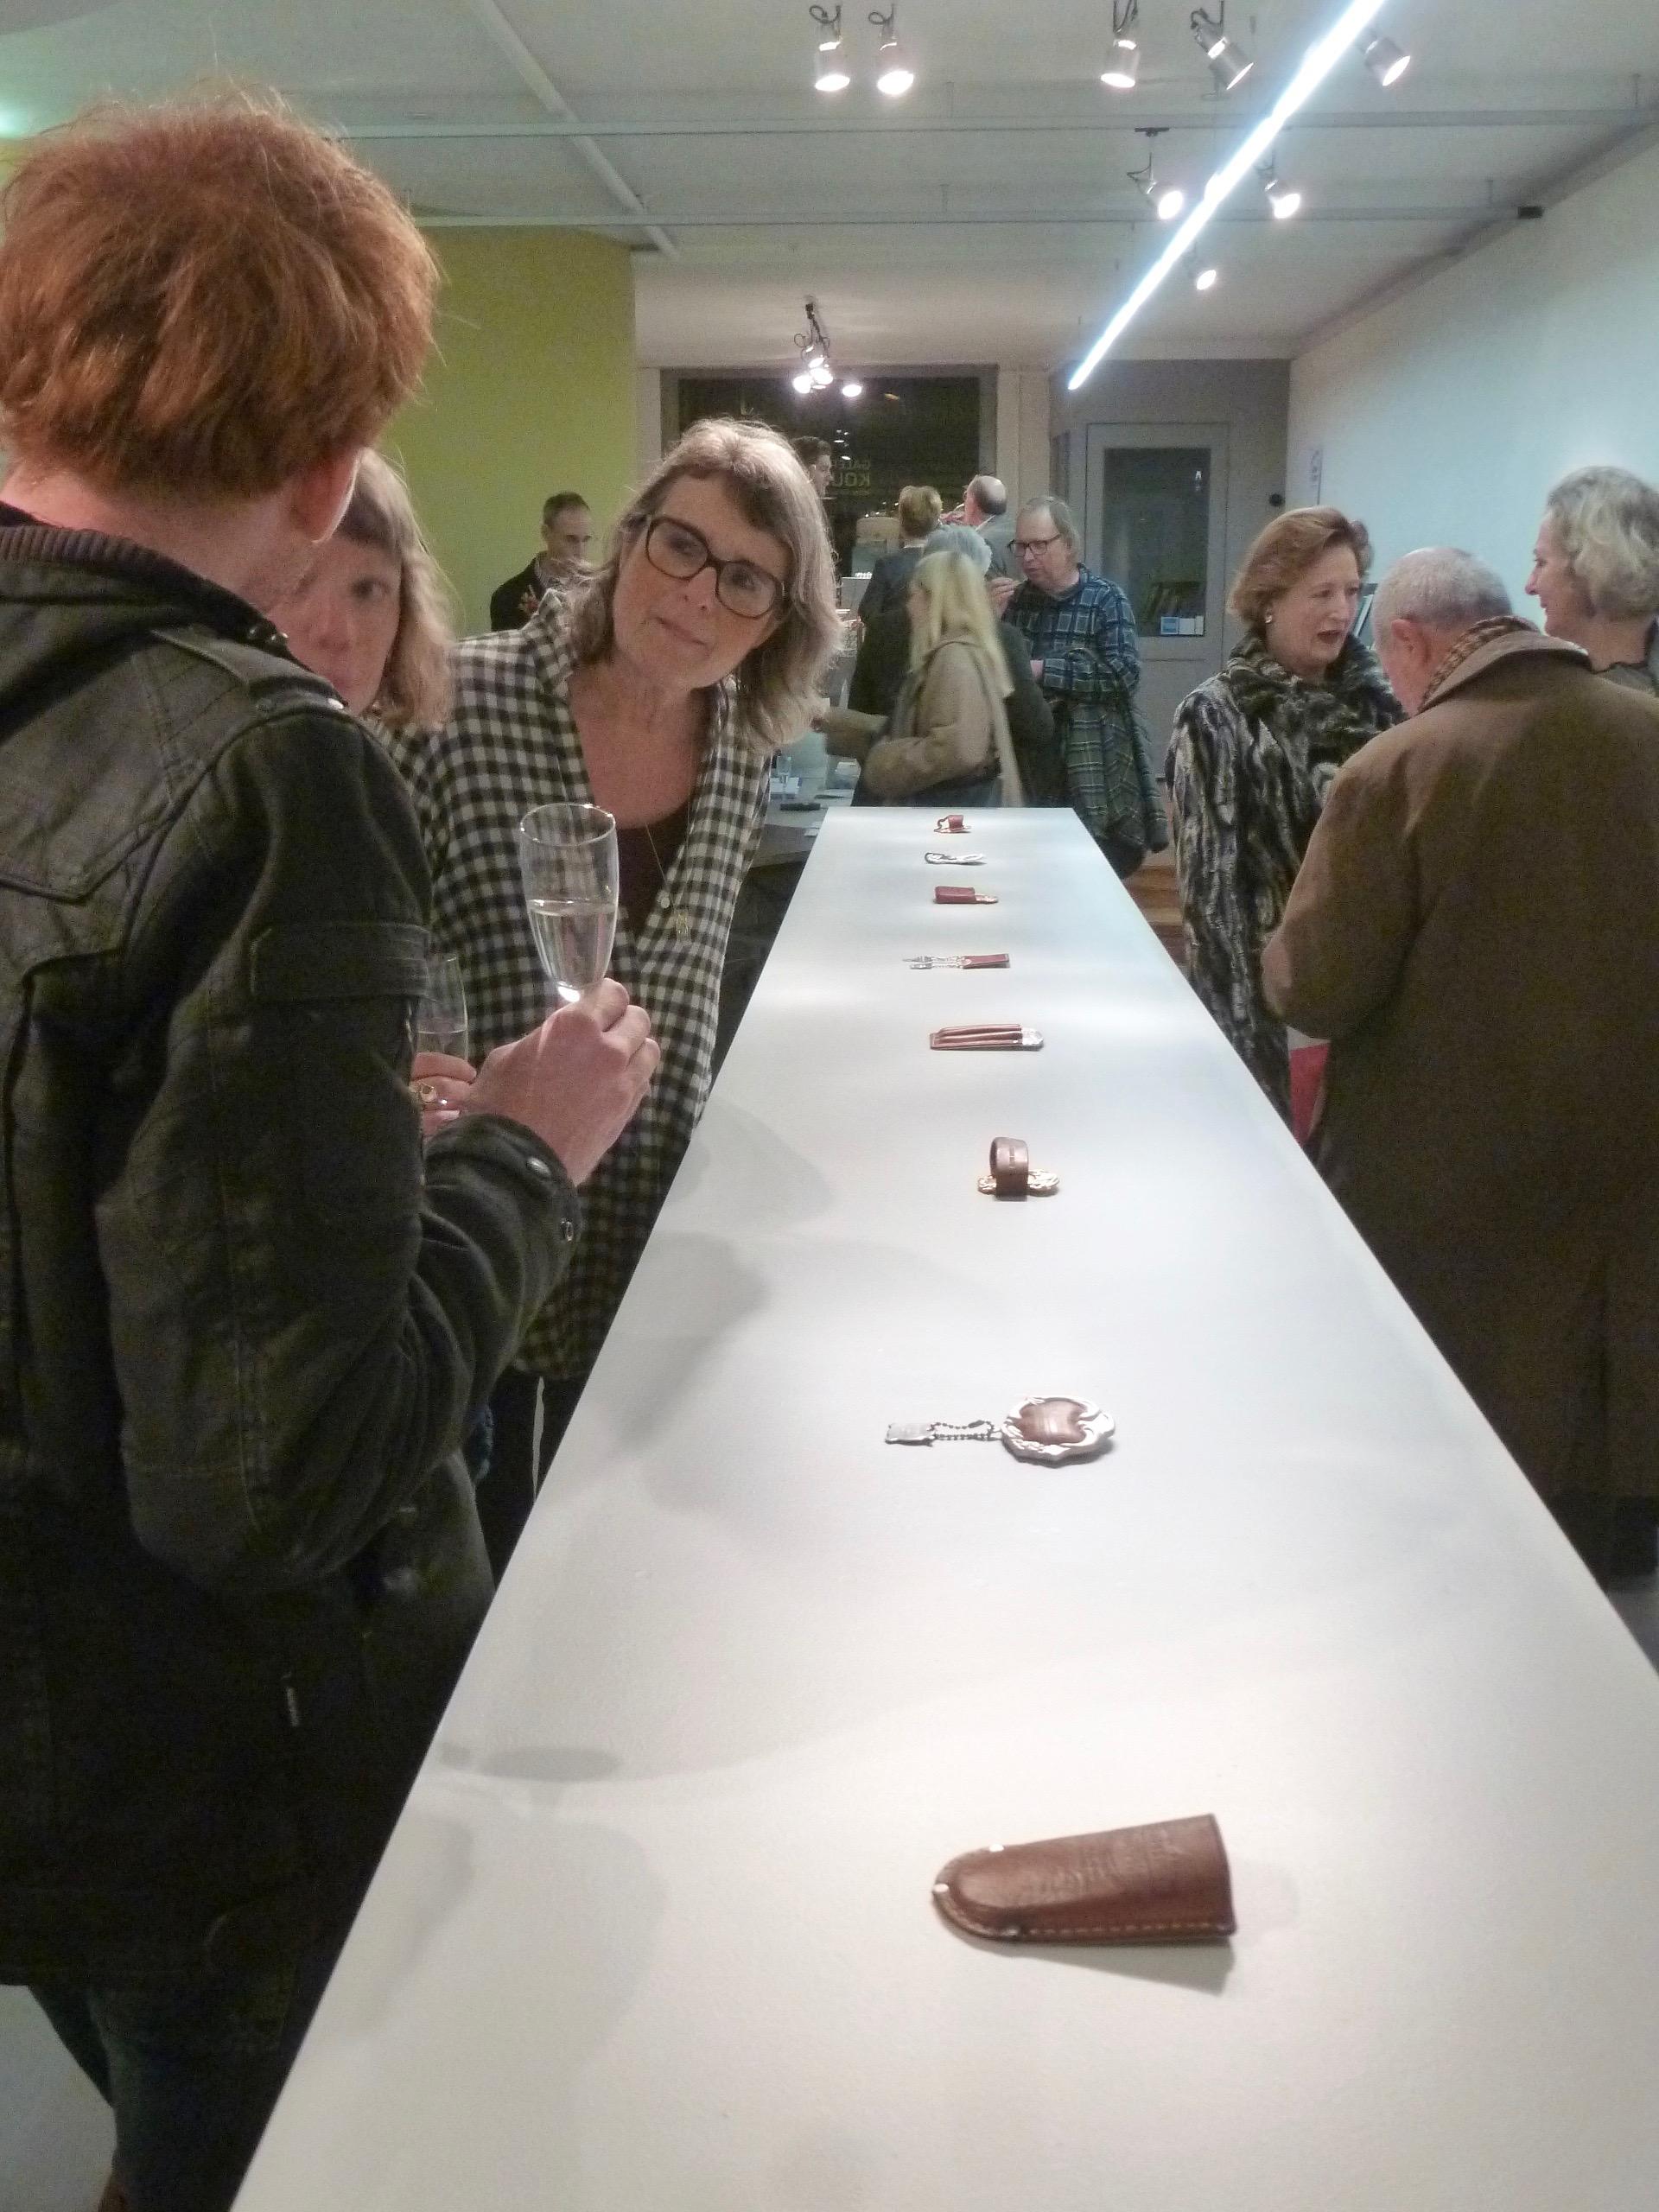 Tobias Alm, The Châtelaine, Galerie Rob Koudijs, 2016, tentoonstelling, opening, Koen Jacobs, Elwy Schutten, Liesbeth den Besten